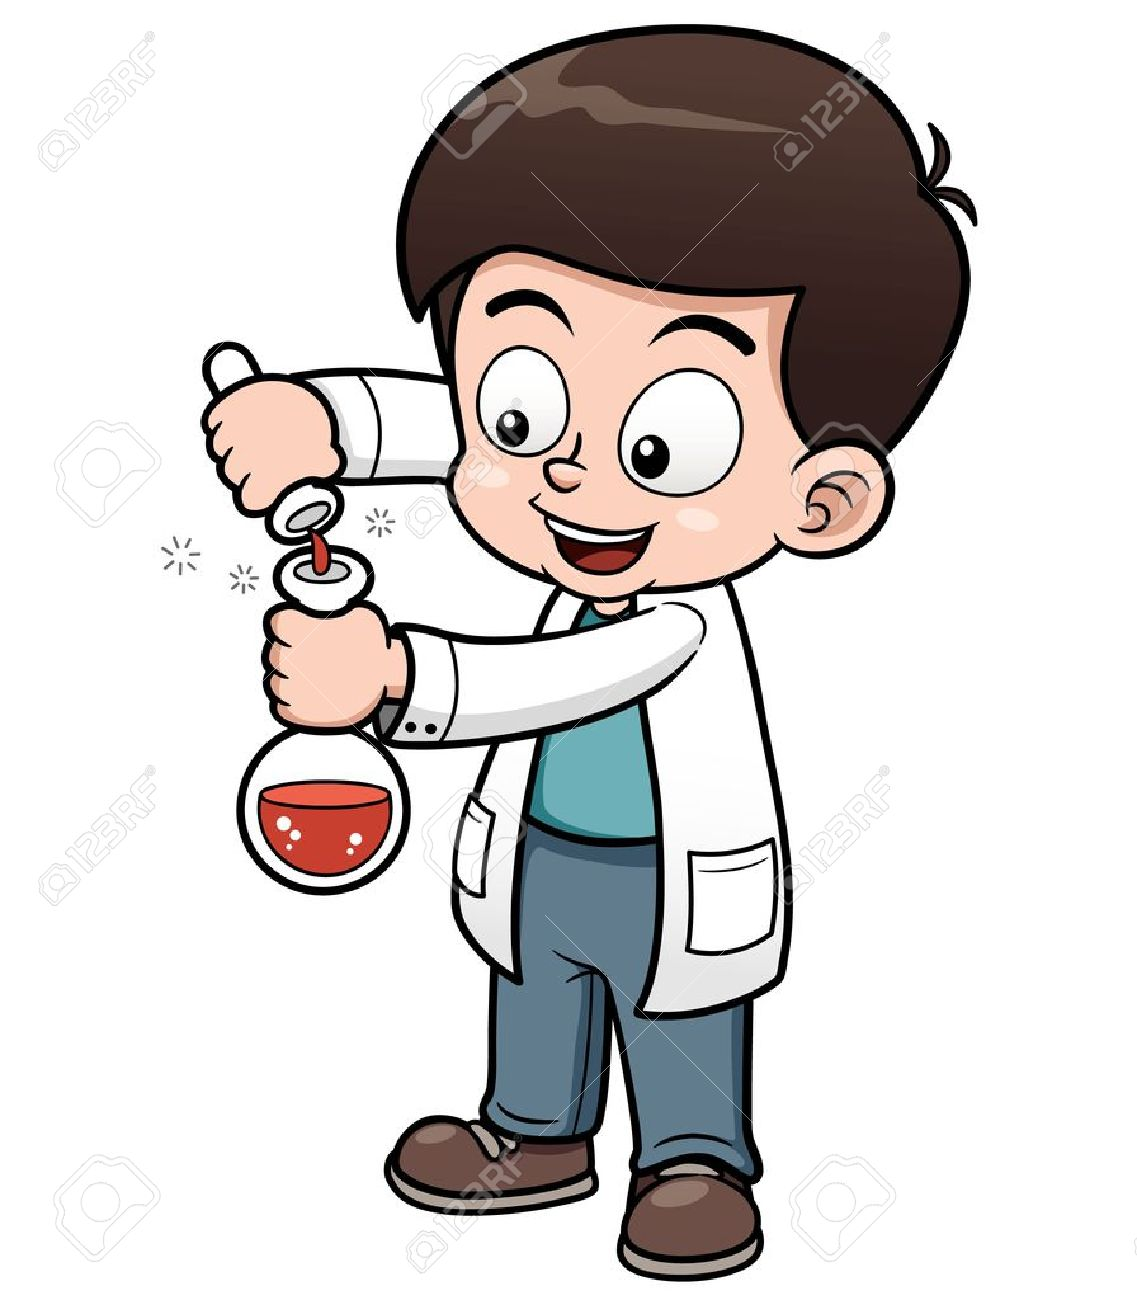 Vector illustration of Little Scientist holding test tube.